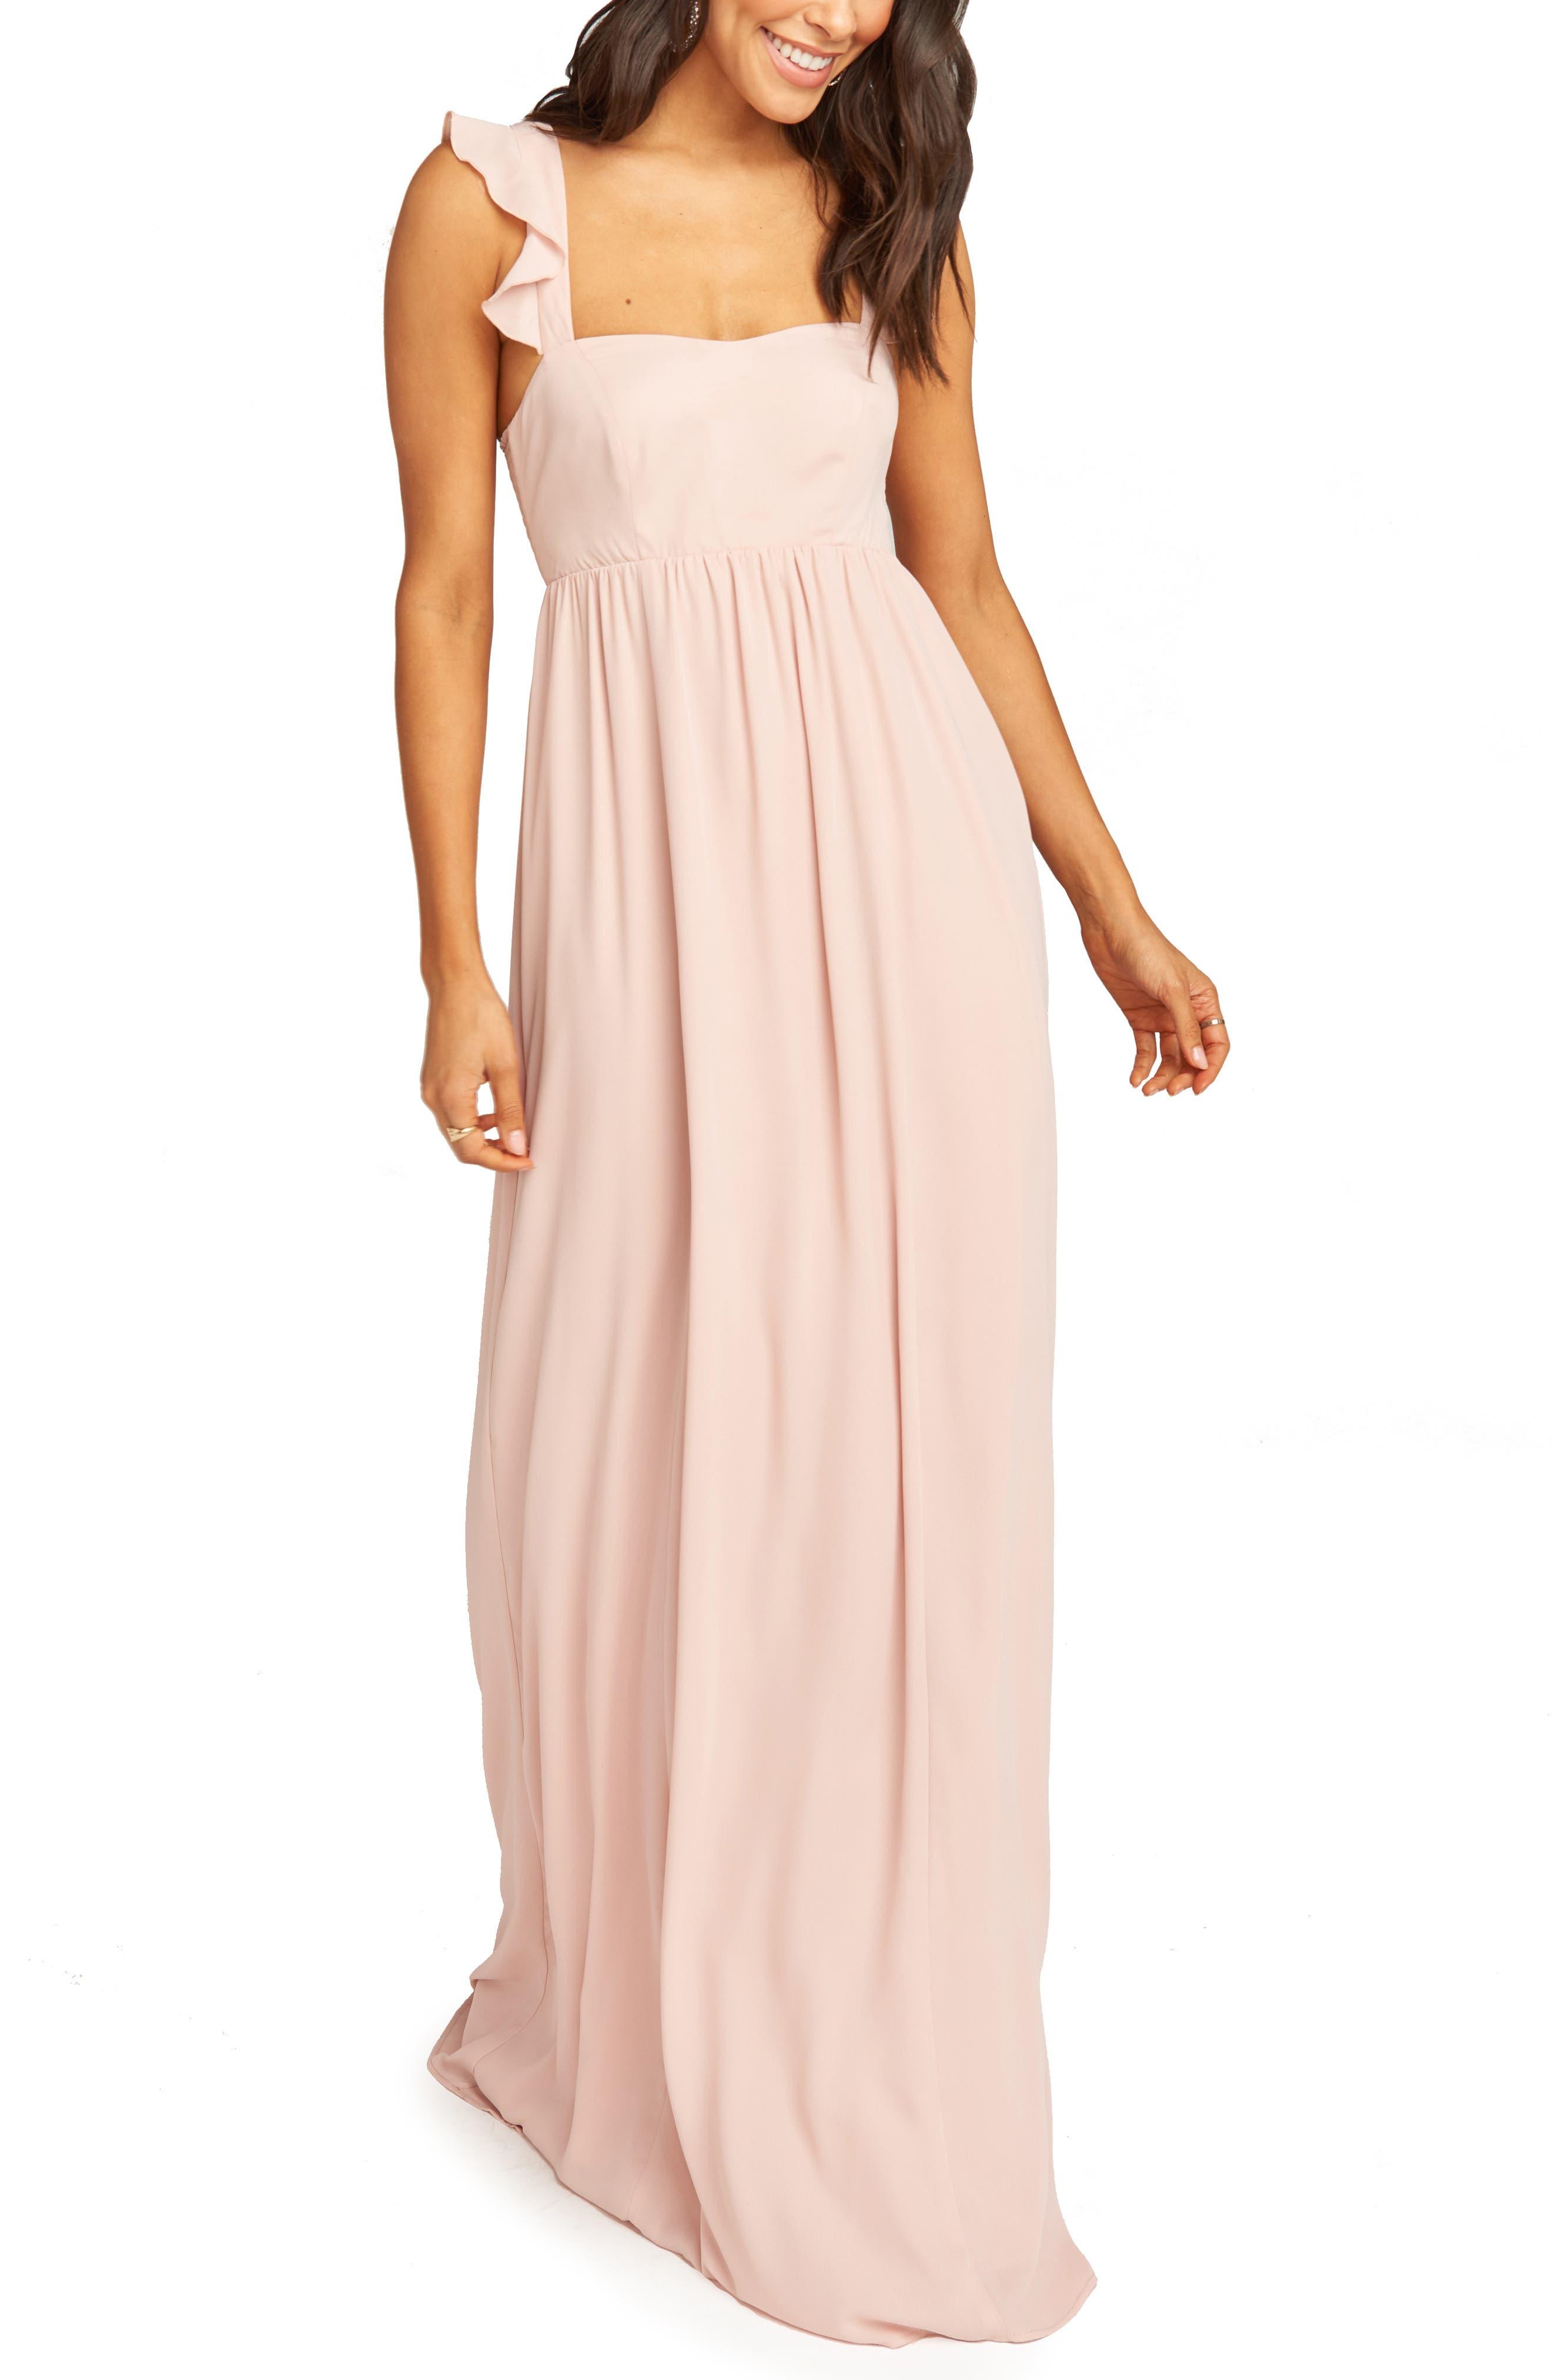 Show Me Your Mumu June Ruffle Strap Evening Dress, Pink